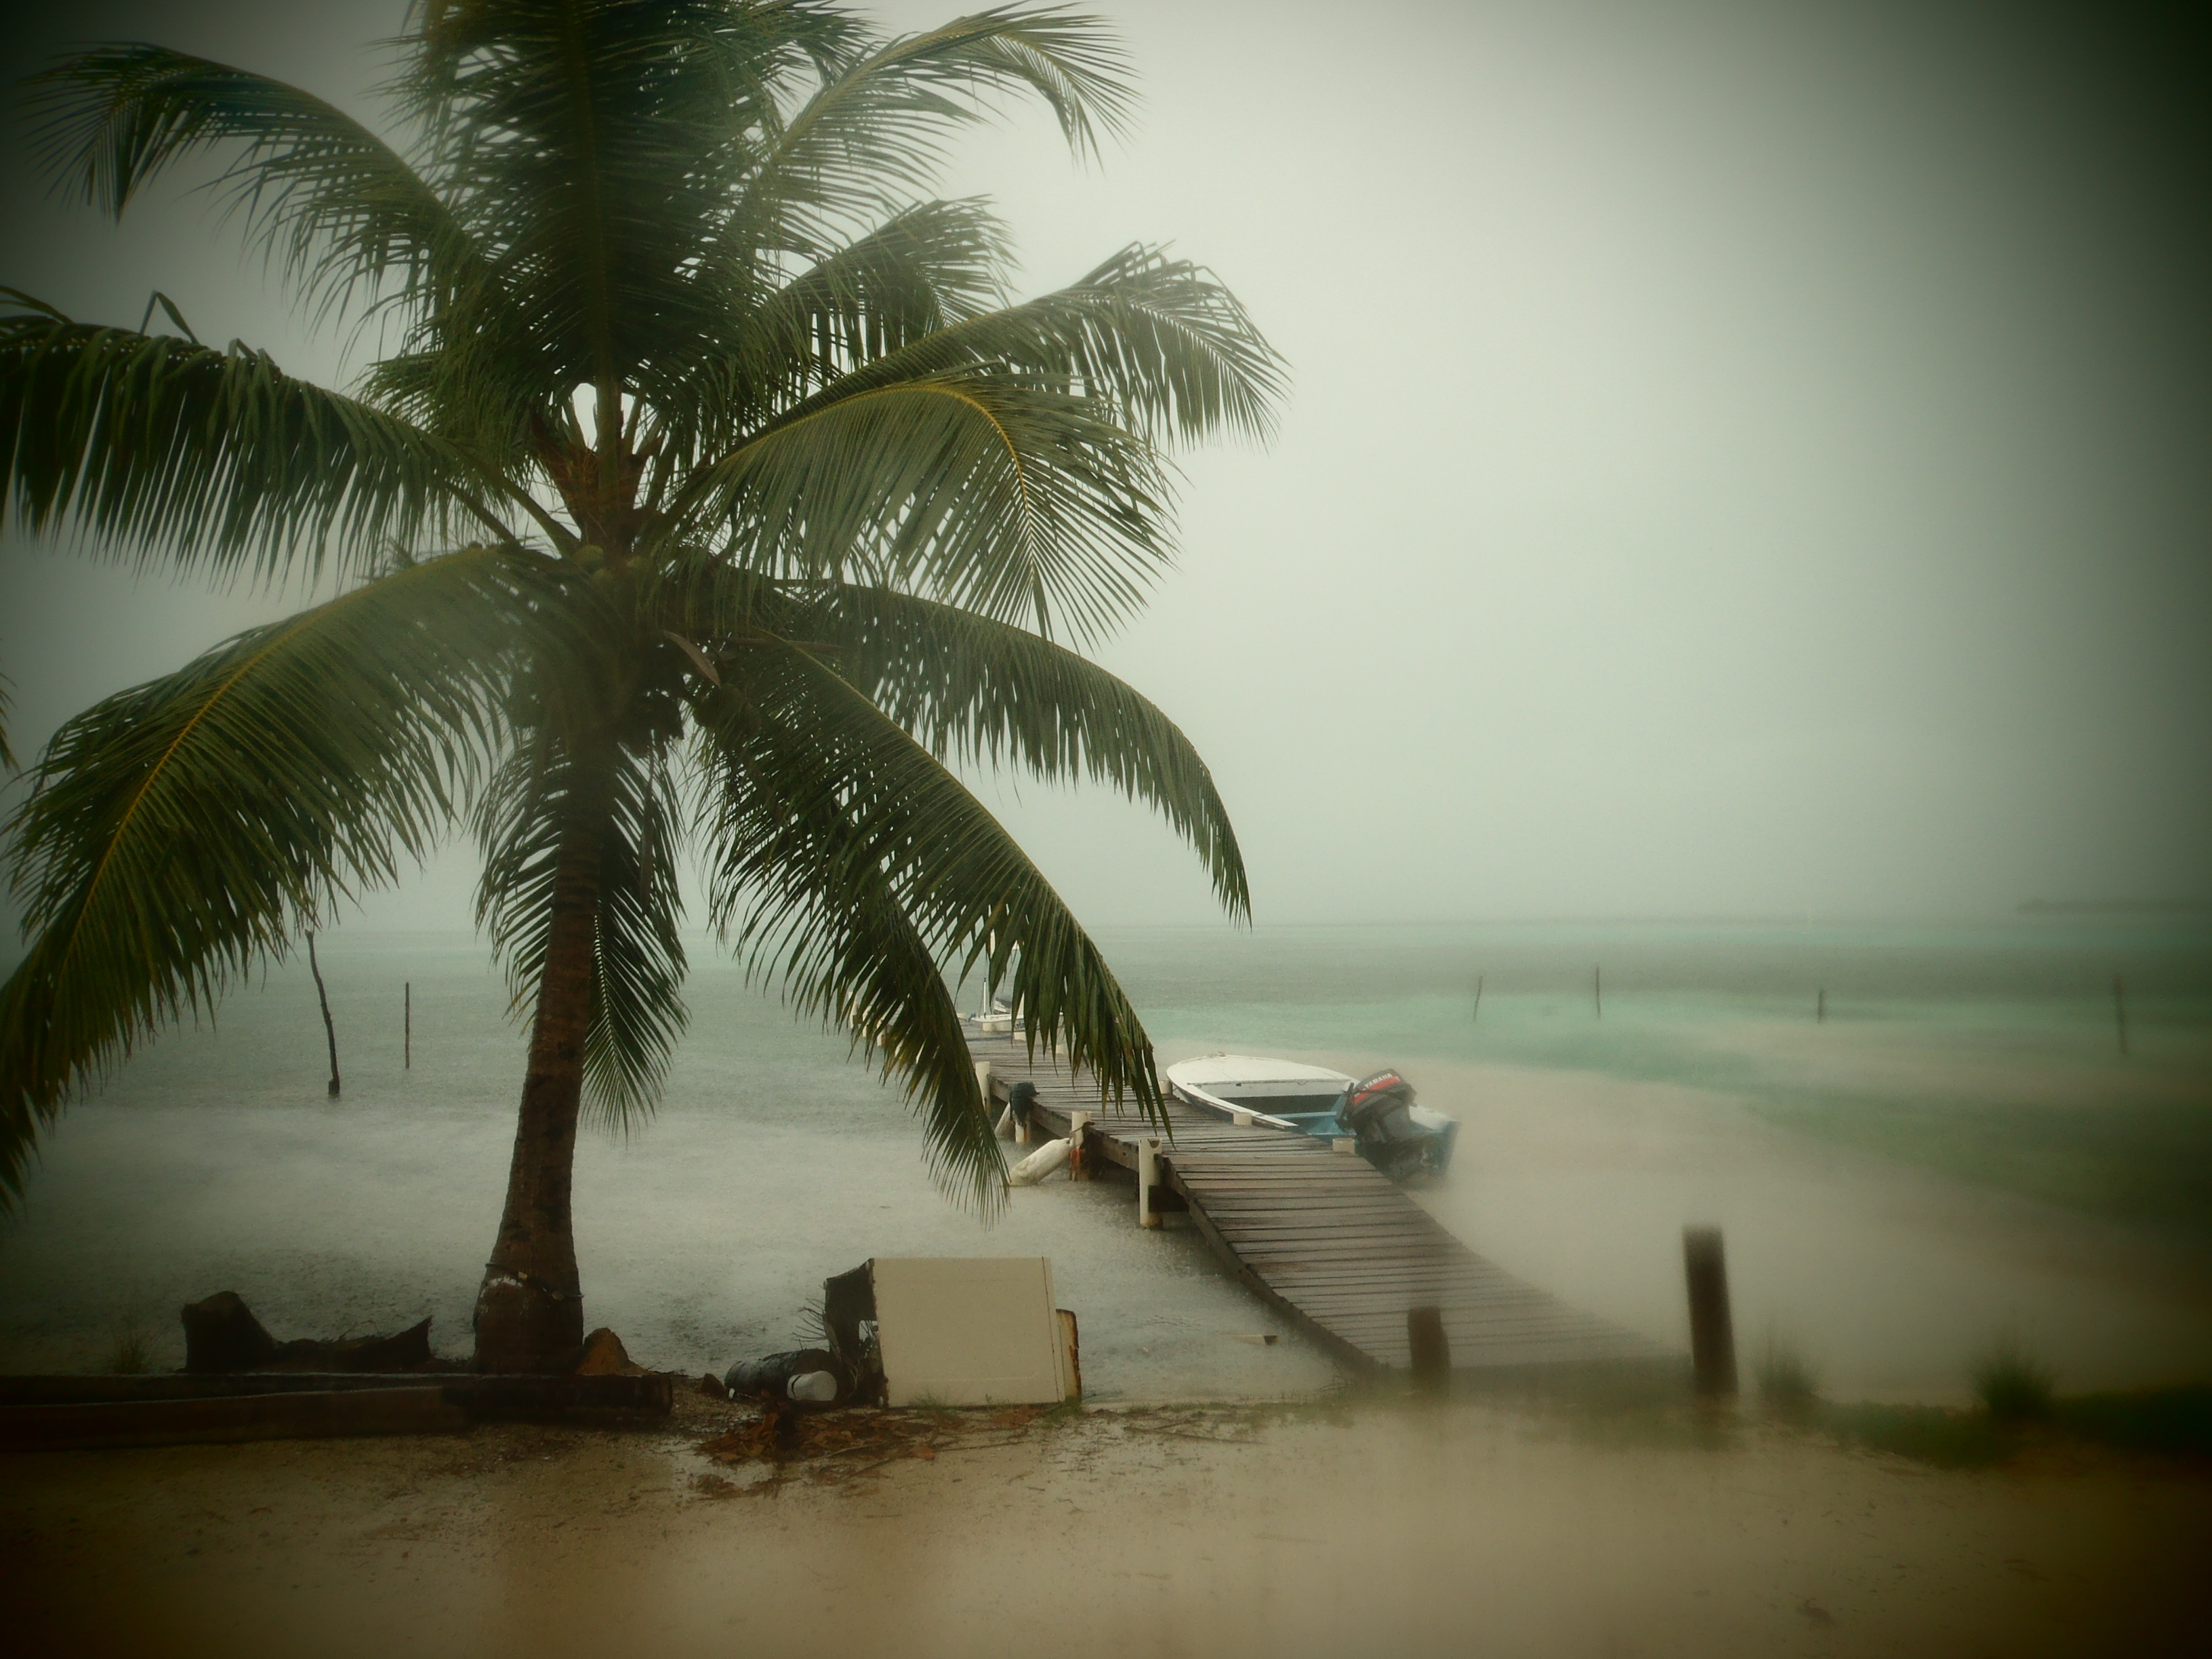 Hurricane Weather; Caye Caulker, Belize; 2013